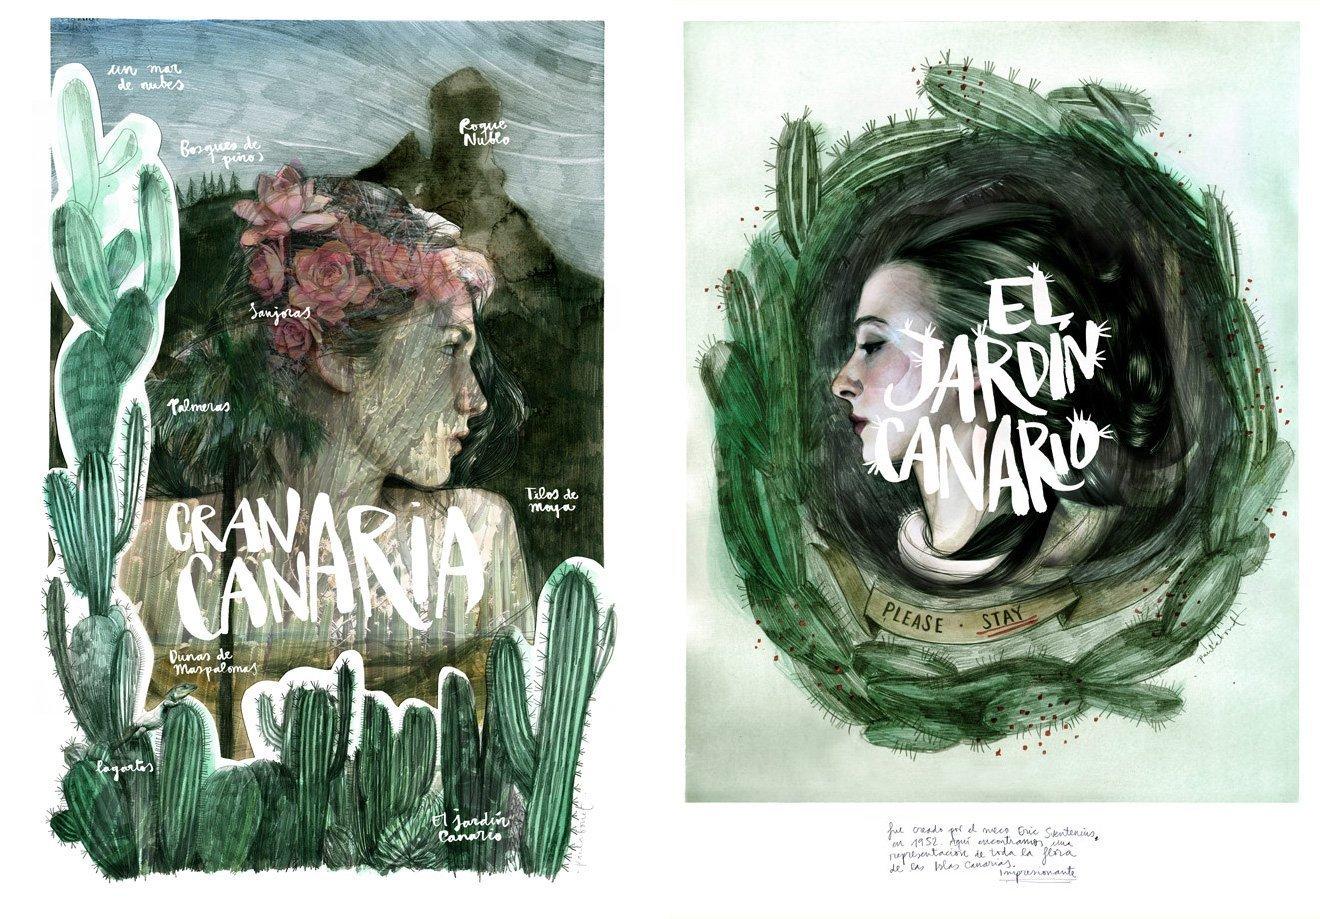 Illustration of Gran Canaria by Paula Bonet